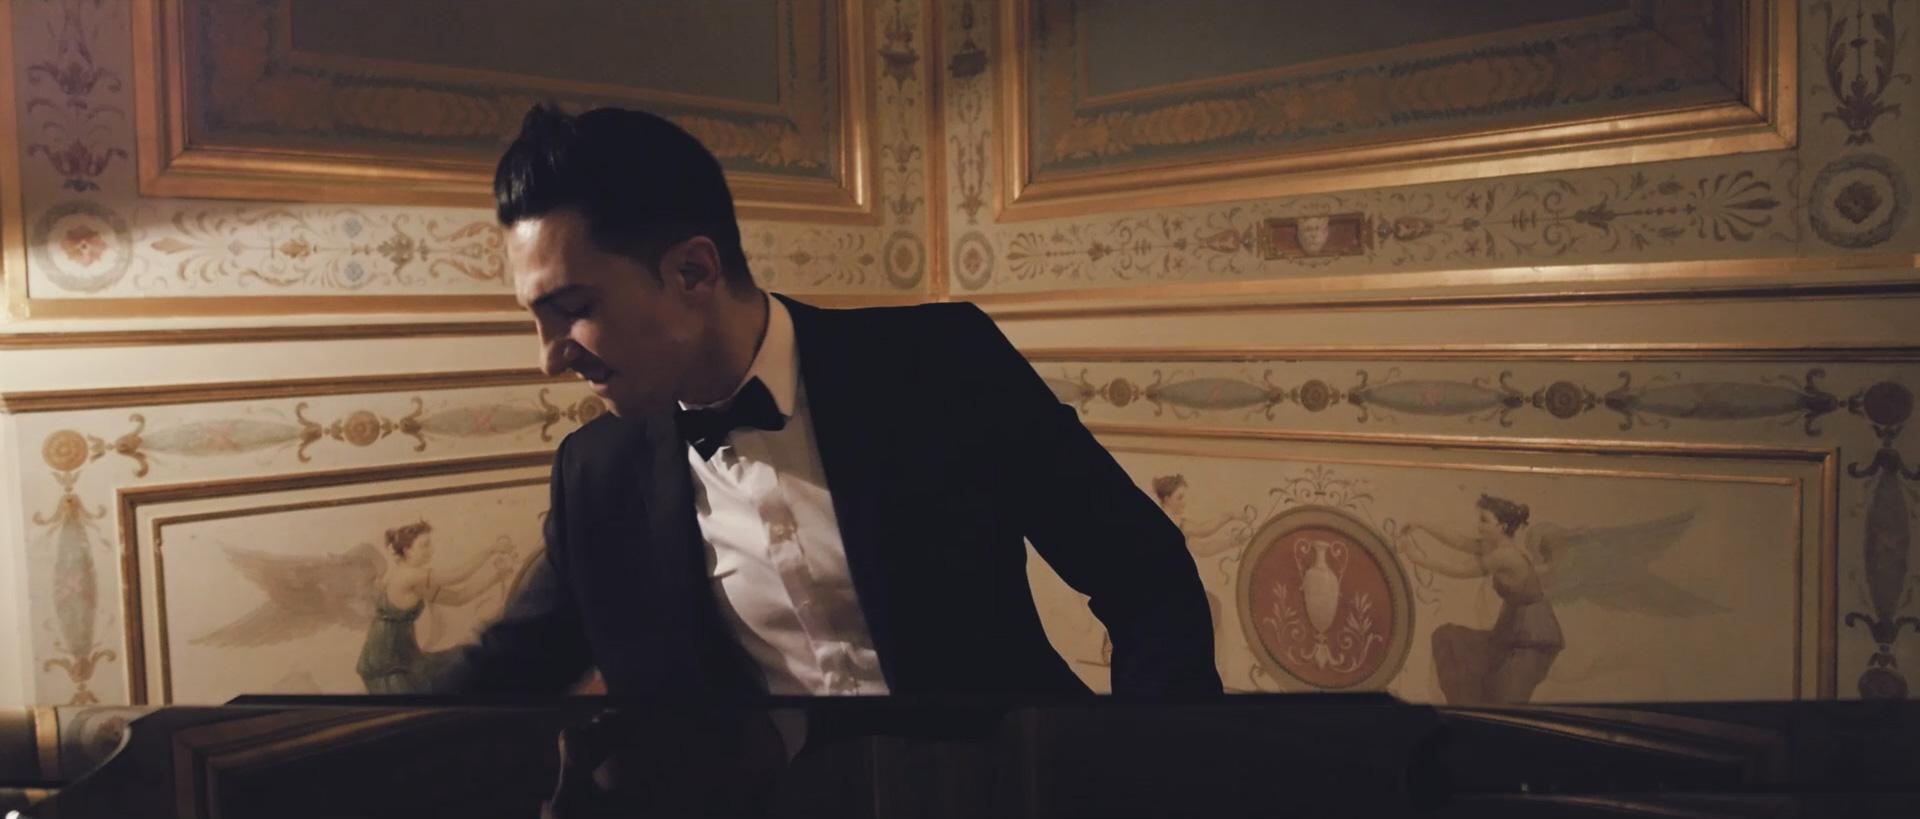 pianiste-moderne-compositeur